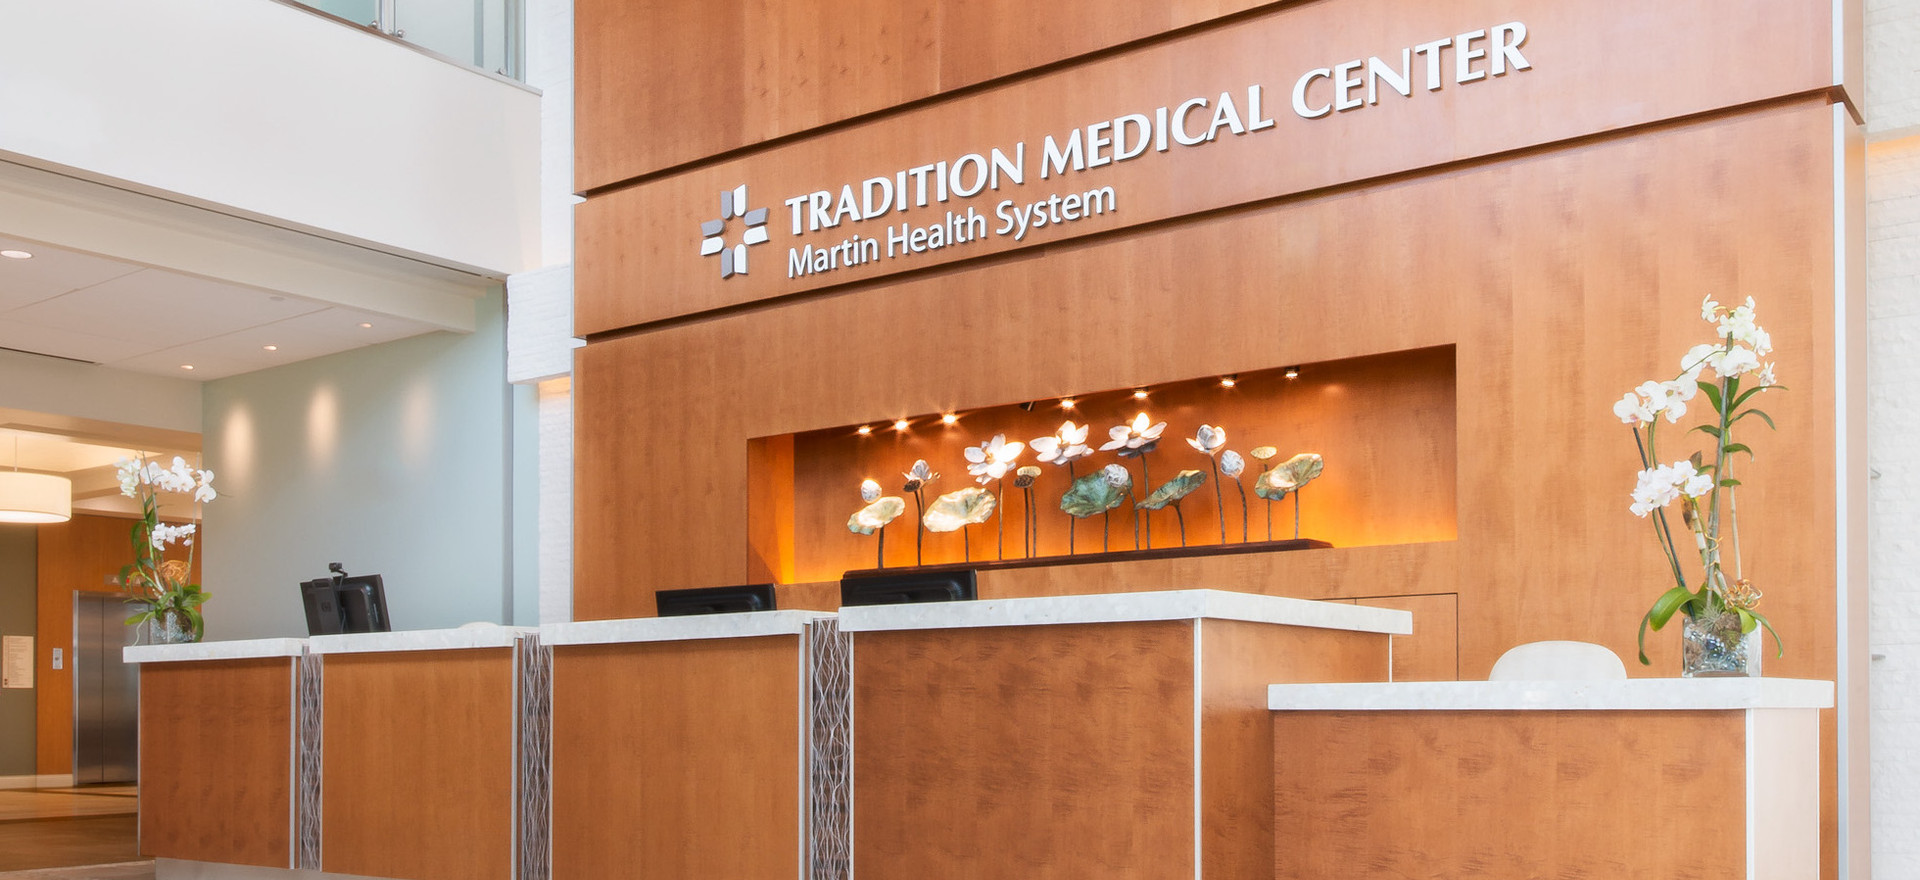 Tradition Medical Center